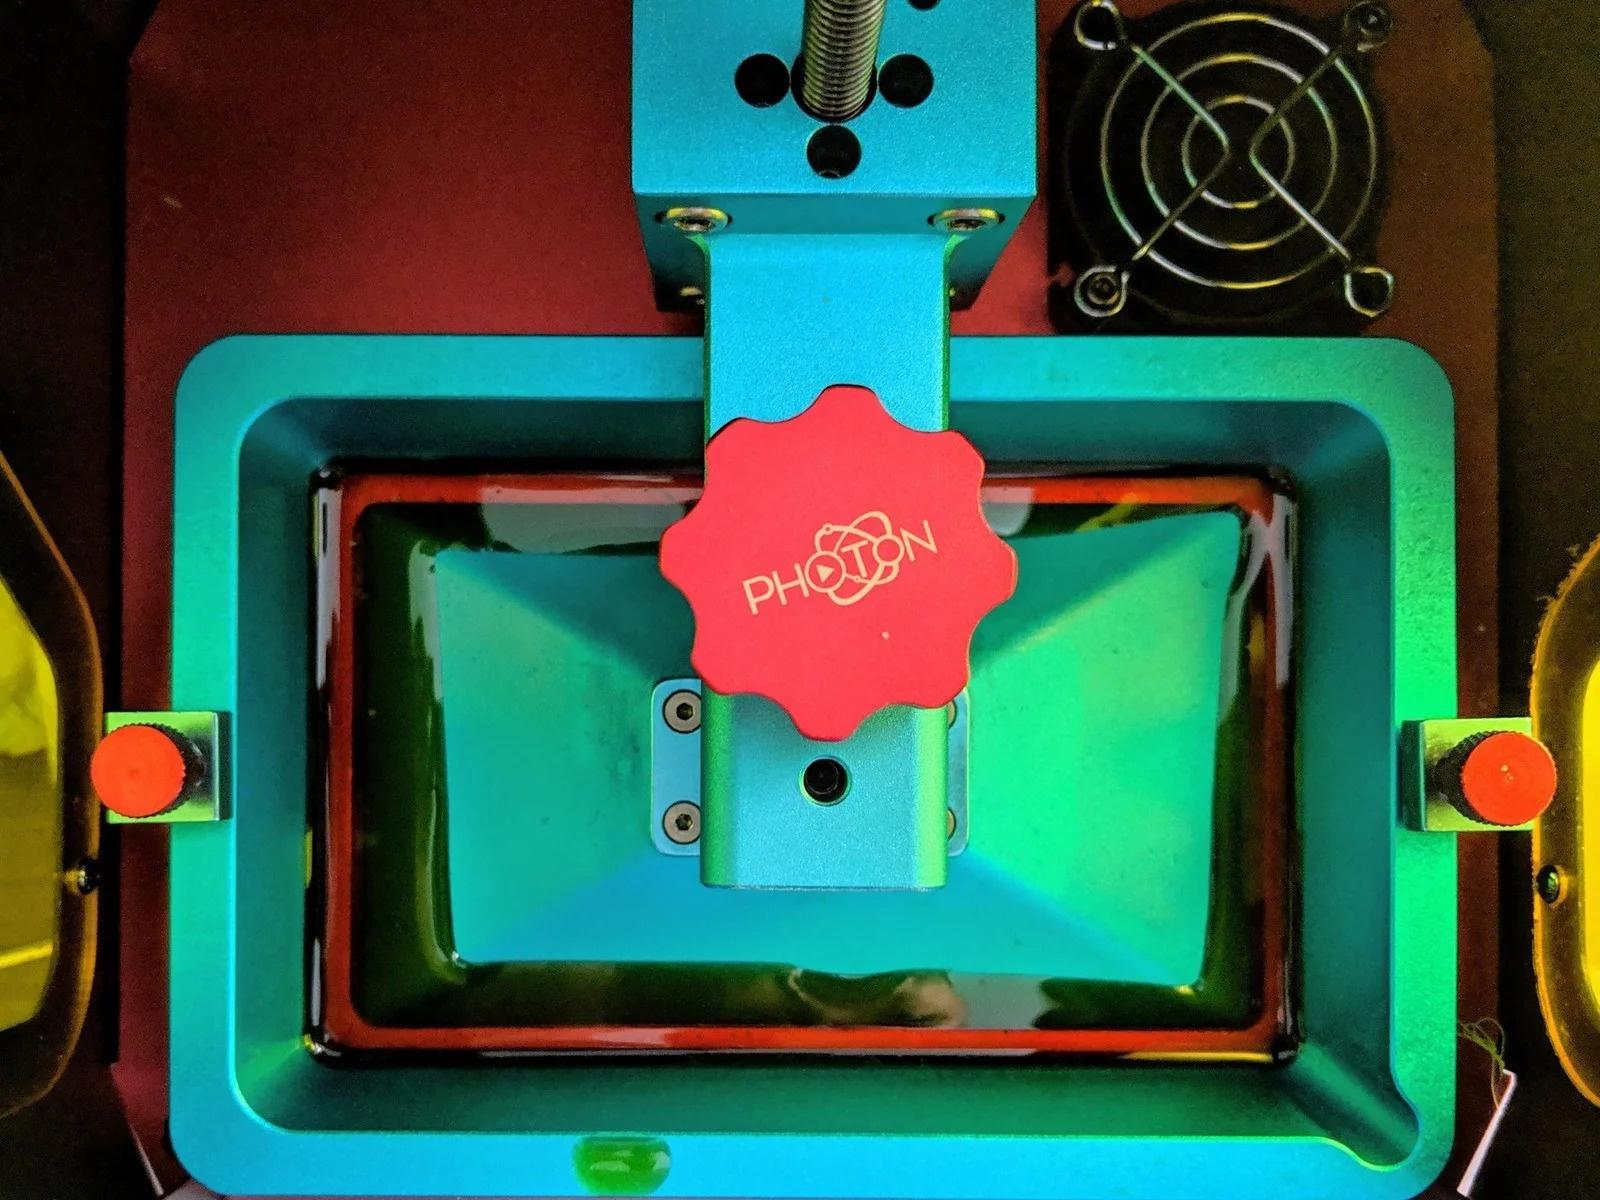 Anycubic Photon VS Anycubic Photon S: Is de upgrade het waard?